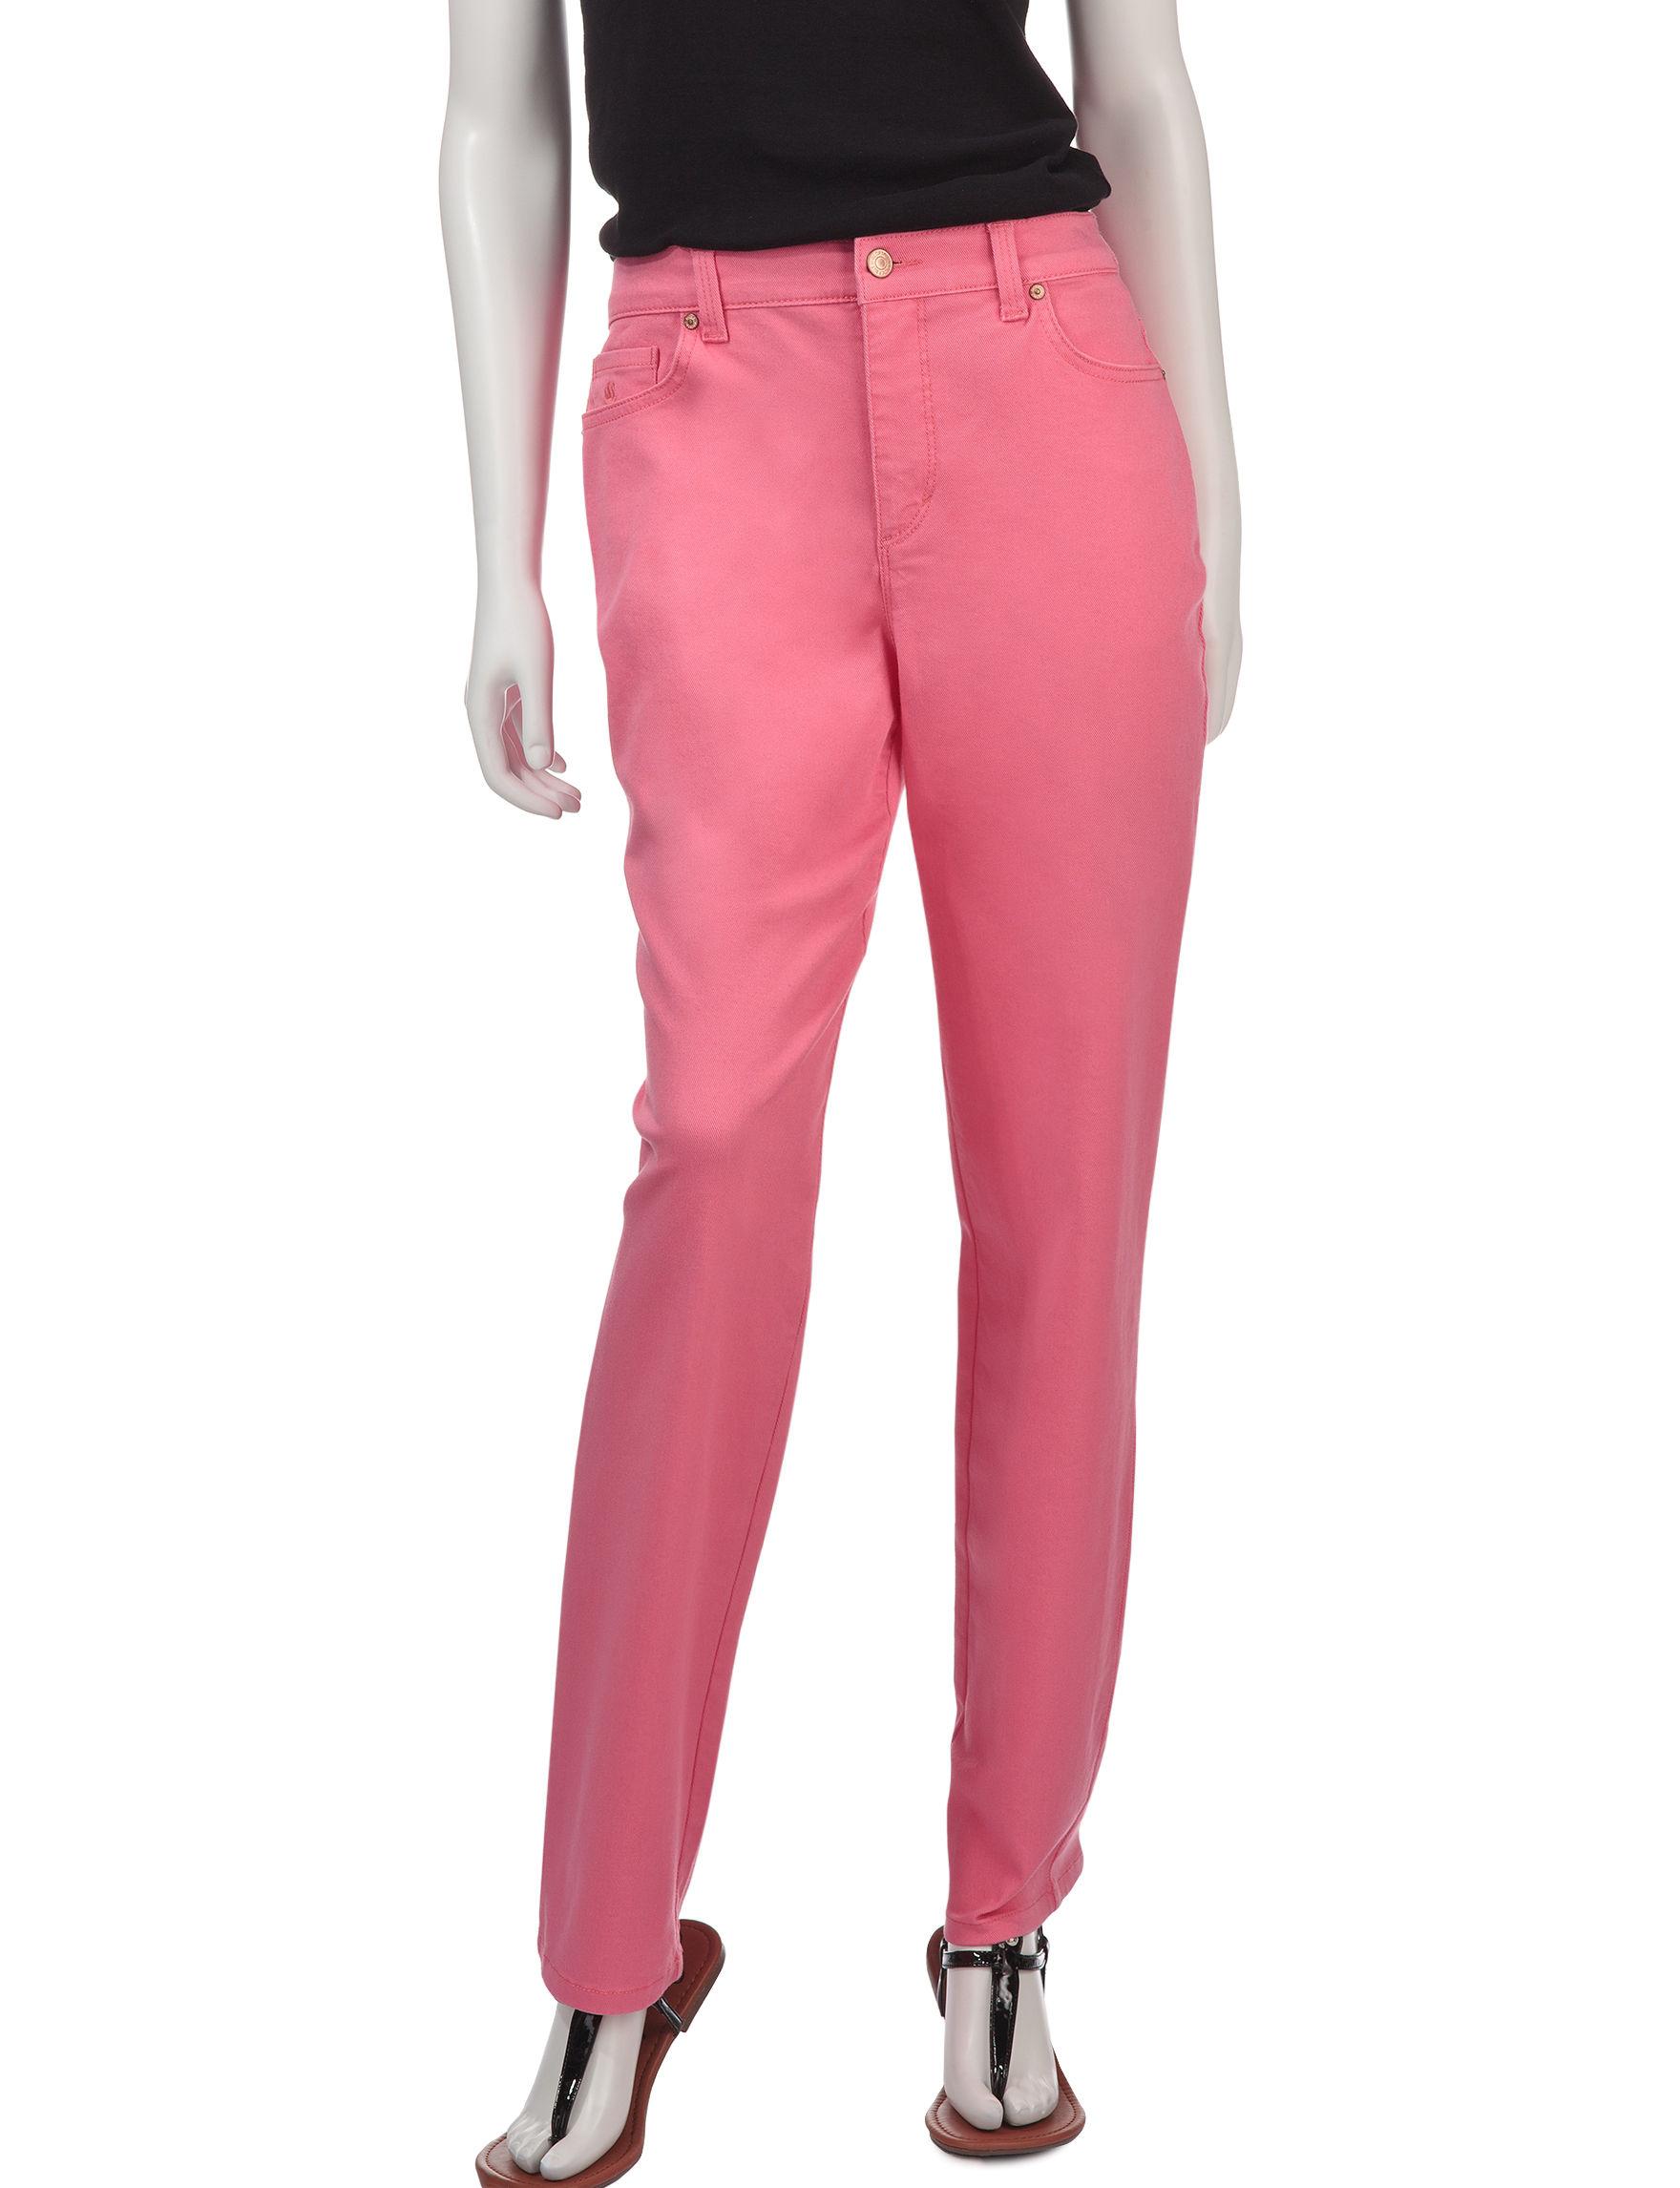 Gloria Vanderbilt Pink Straight